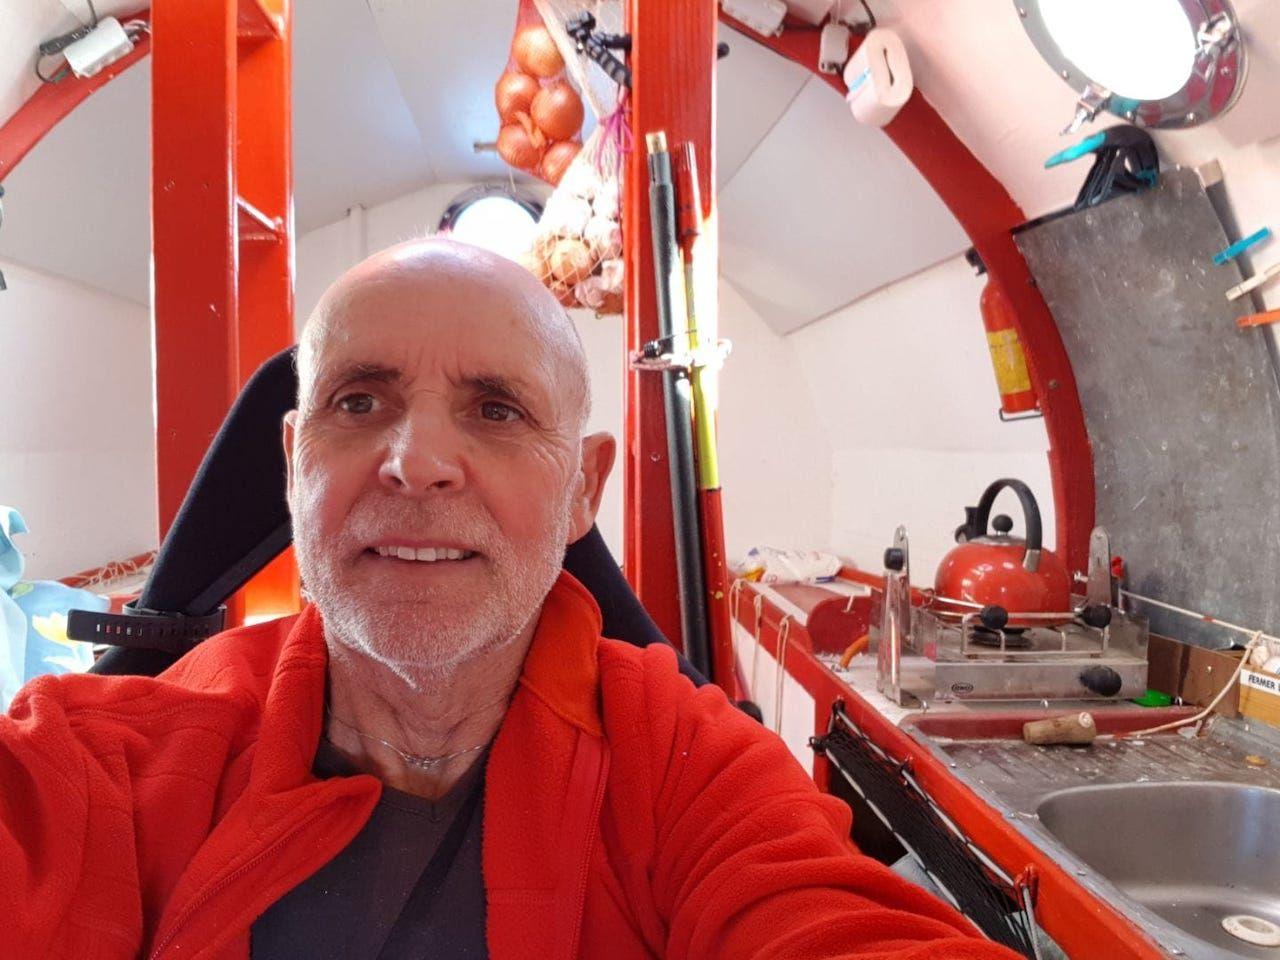 Jean-Jacques Savin inside of the barrel he'll cross the Atlantic in